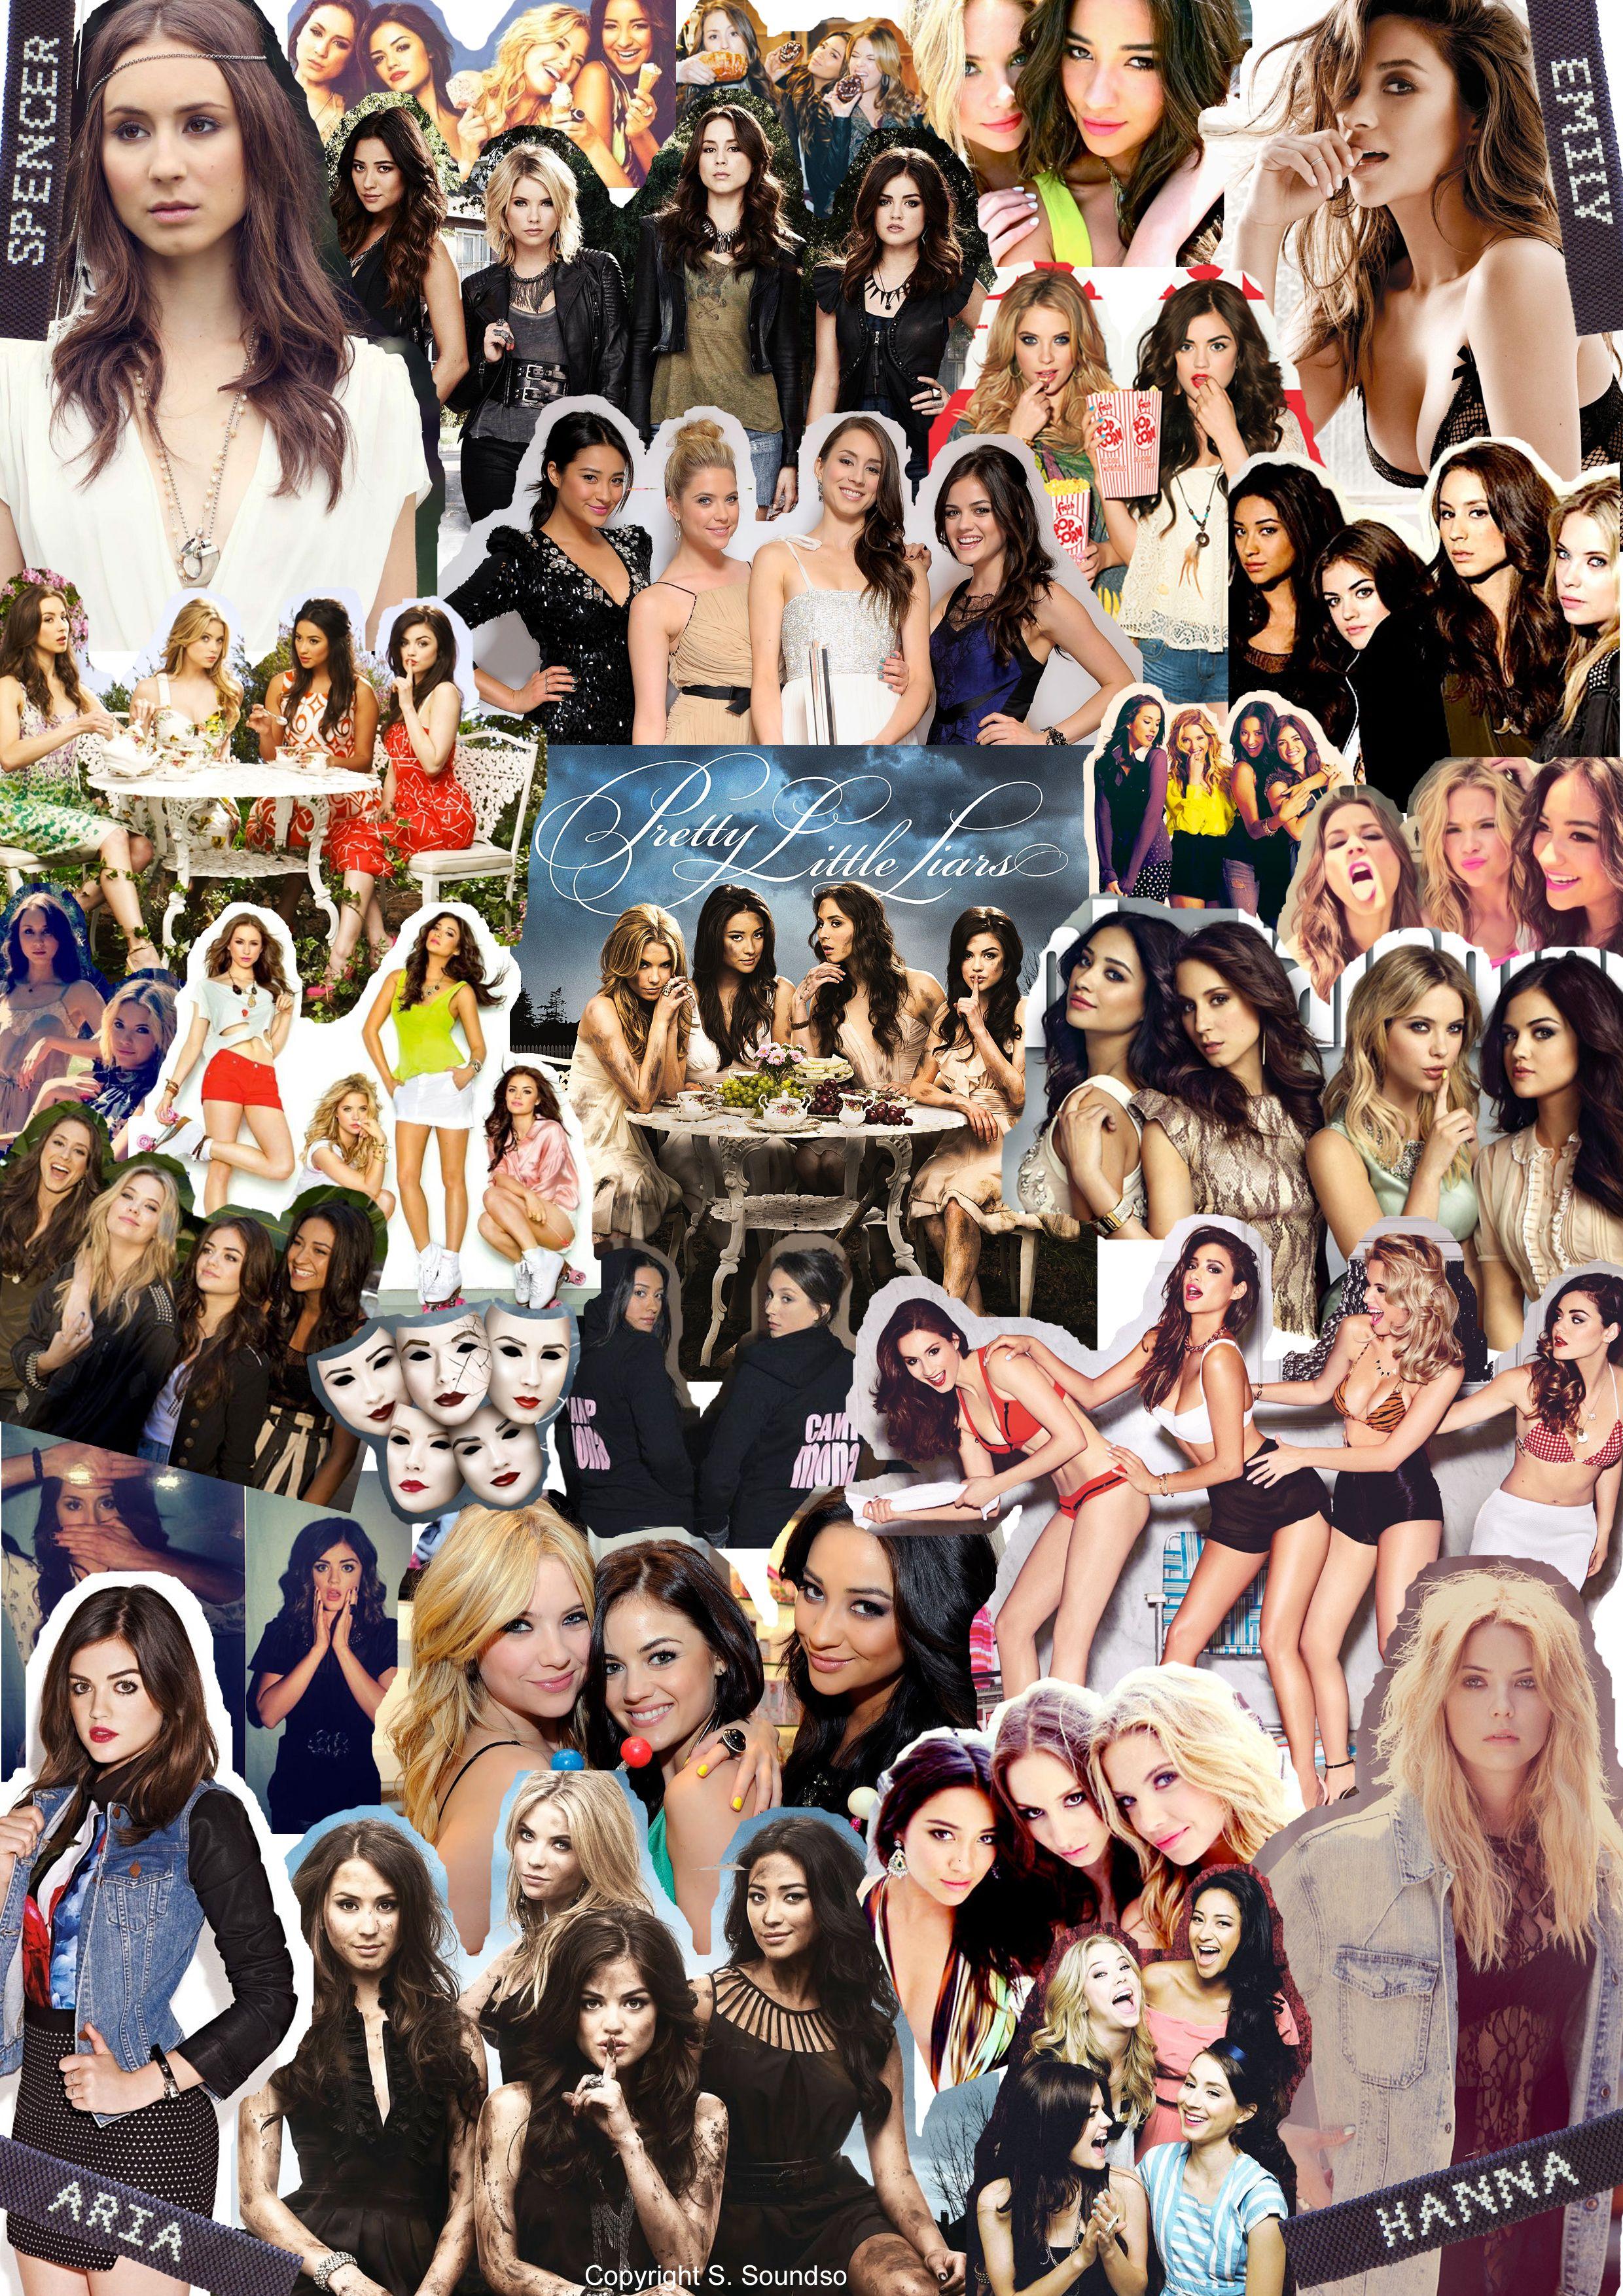 Výsledek obrázku pro pretty little liars collage